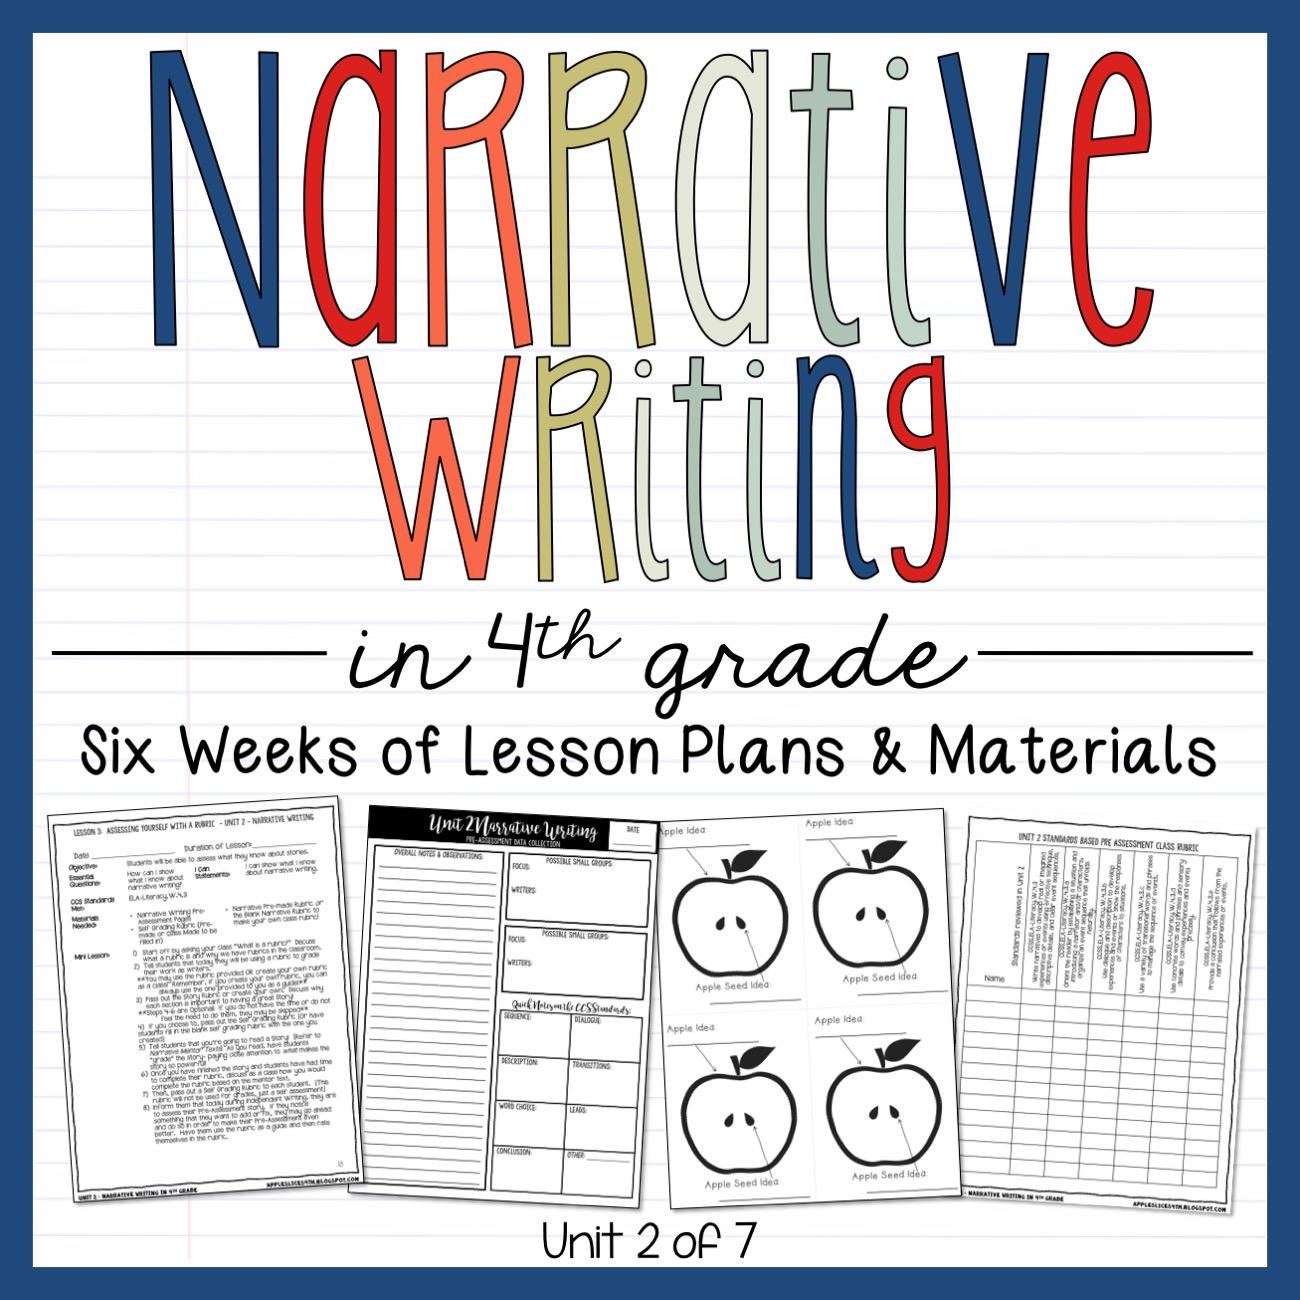 Narrative Writing 4th Grade Writing Unit